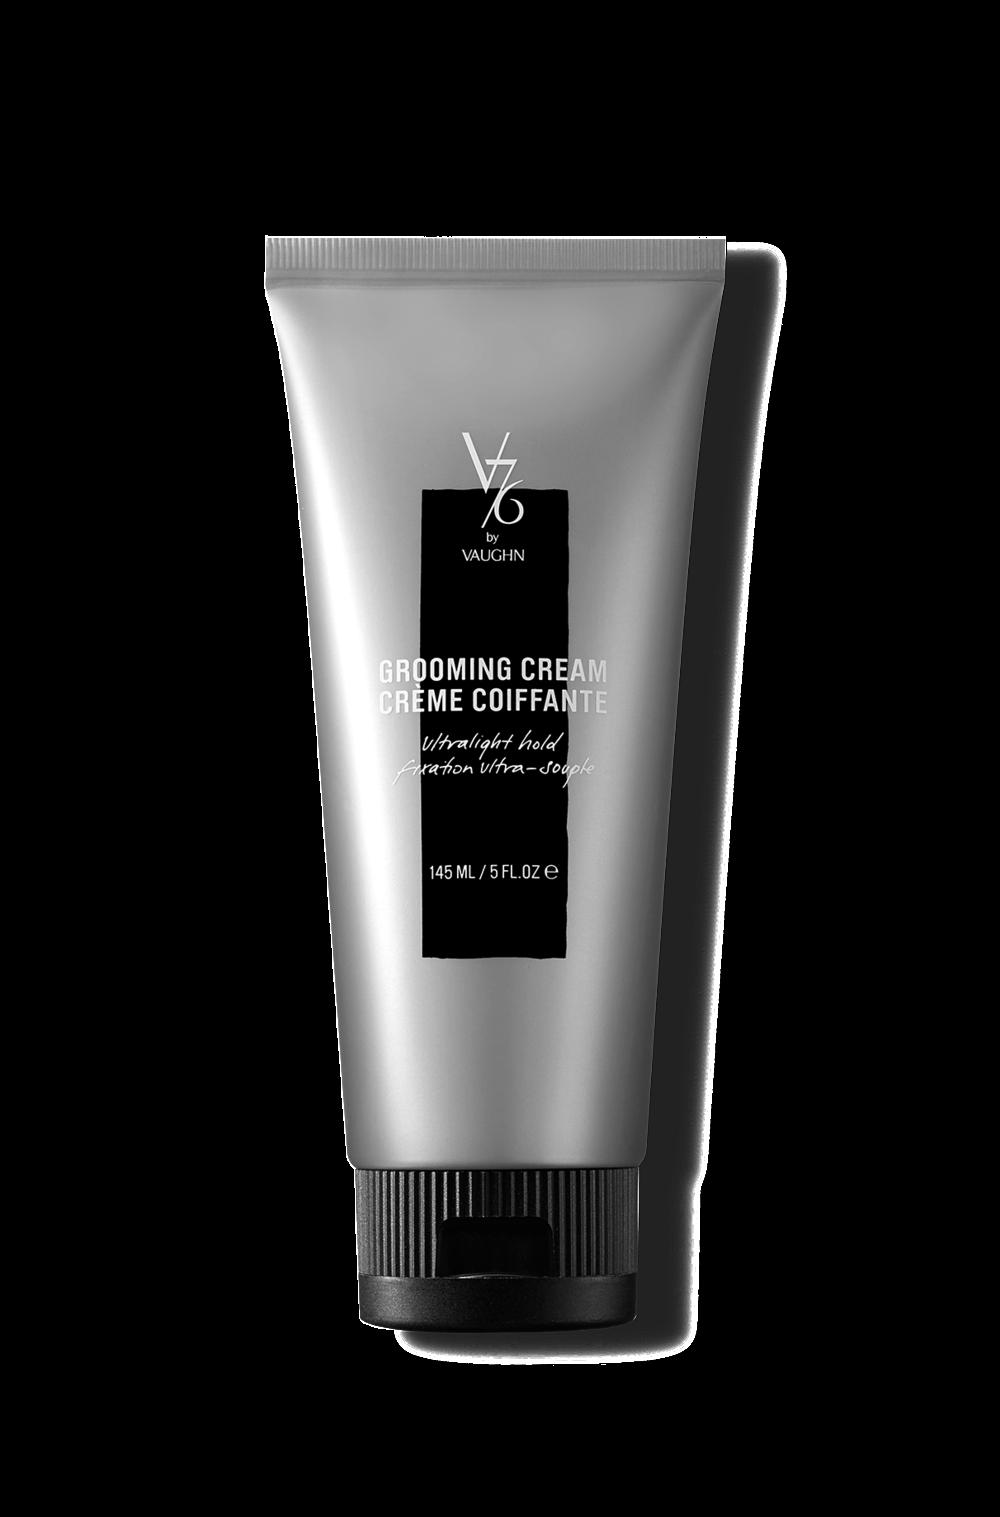 V76 by Vaughn  Grooming Cream, 5 oz. $20.00